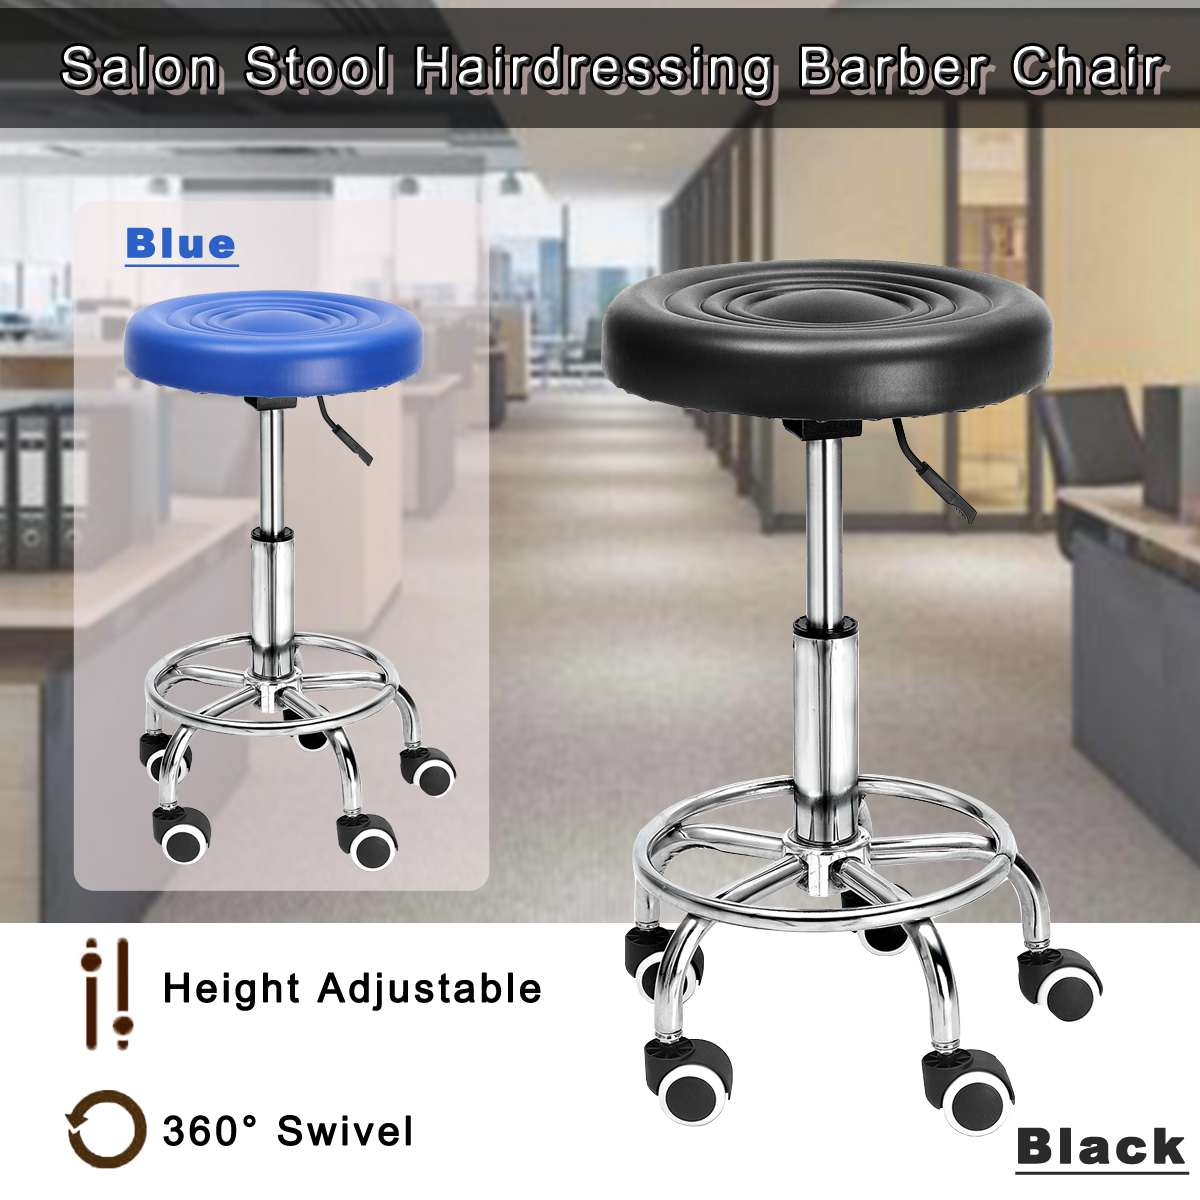 Adjustable Height Gas Lift Retro Bar Stools Modern Hollow Bar Barber Salon Chair Home High Stool Continental Rotating